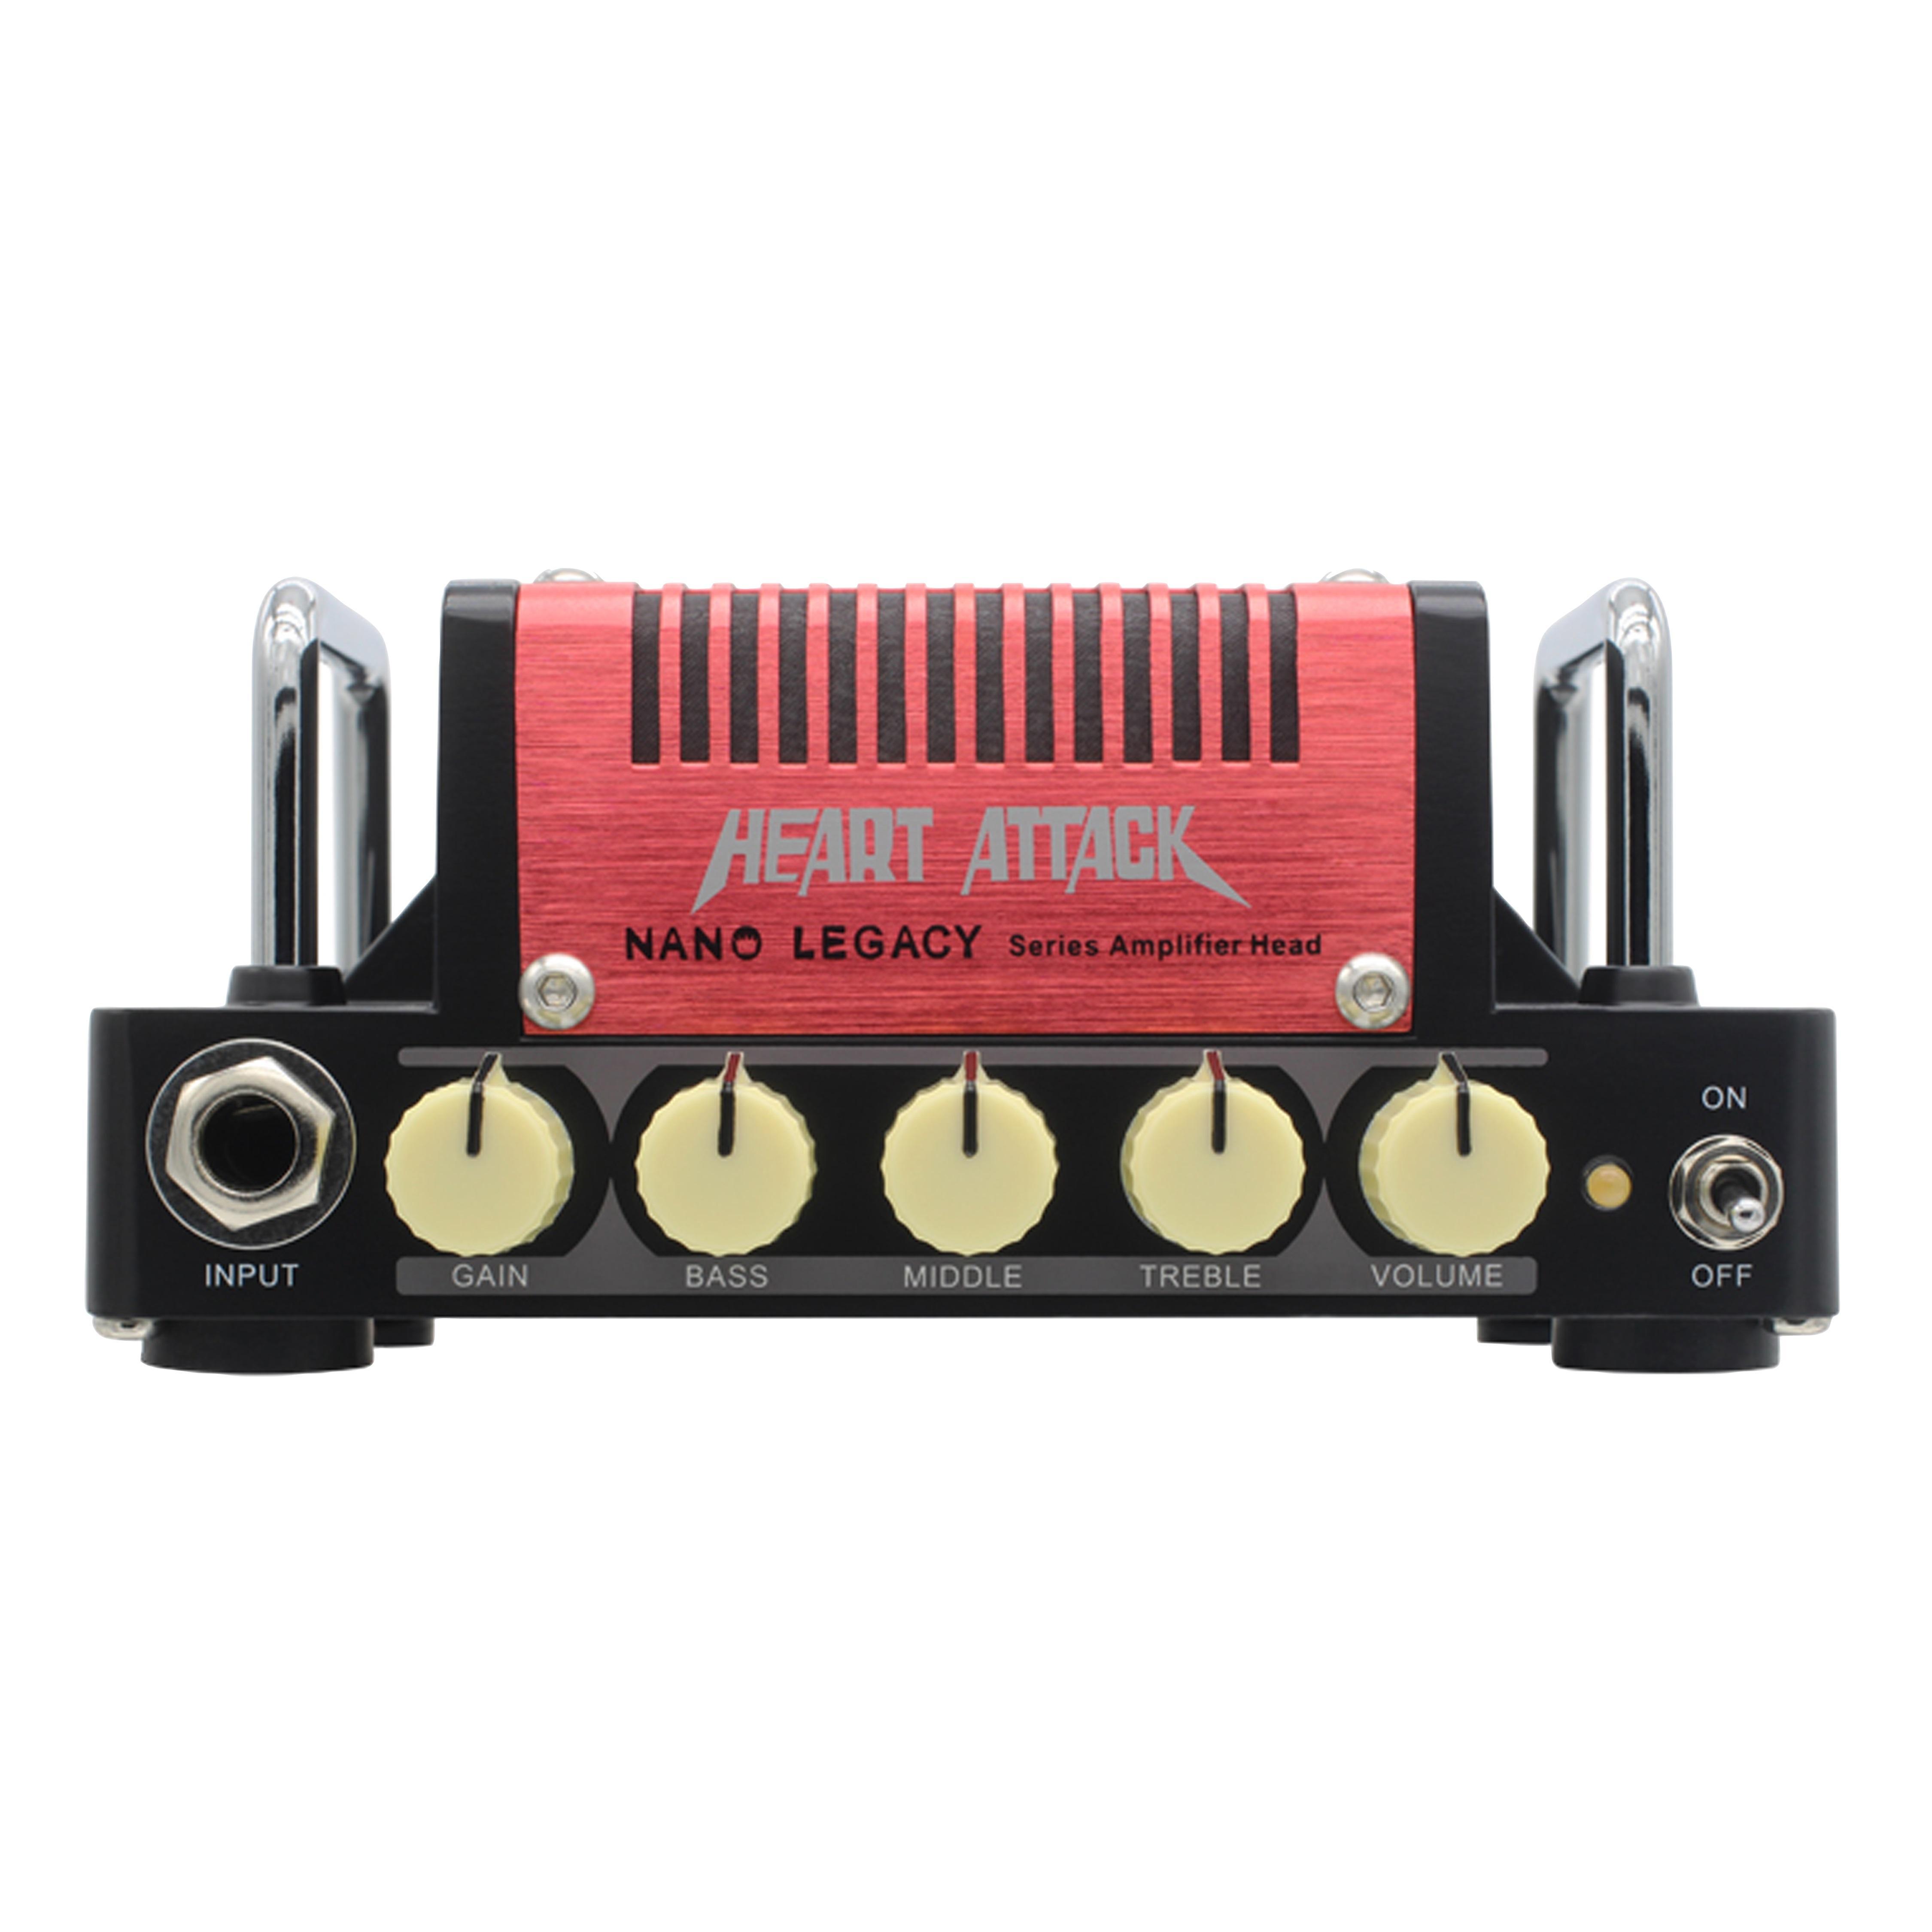 Hotone Heart Attack 5 Watt Mini Guitar Amplifier Head 4x12 Speaker Cabinet Wiring Stereo Mono Google Groups View Larger